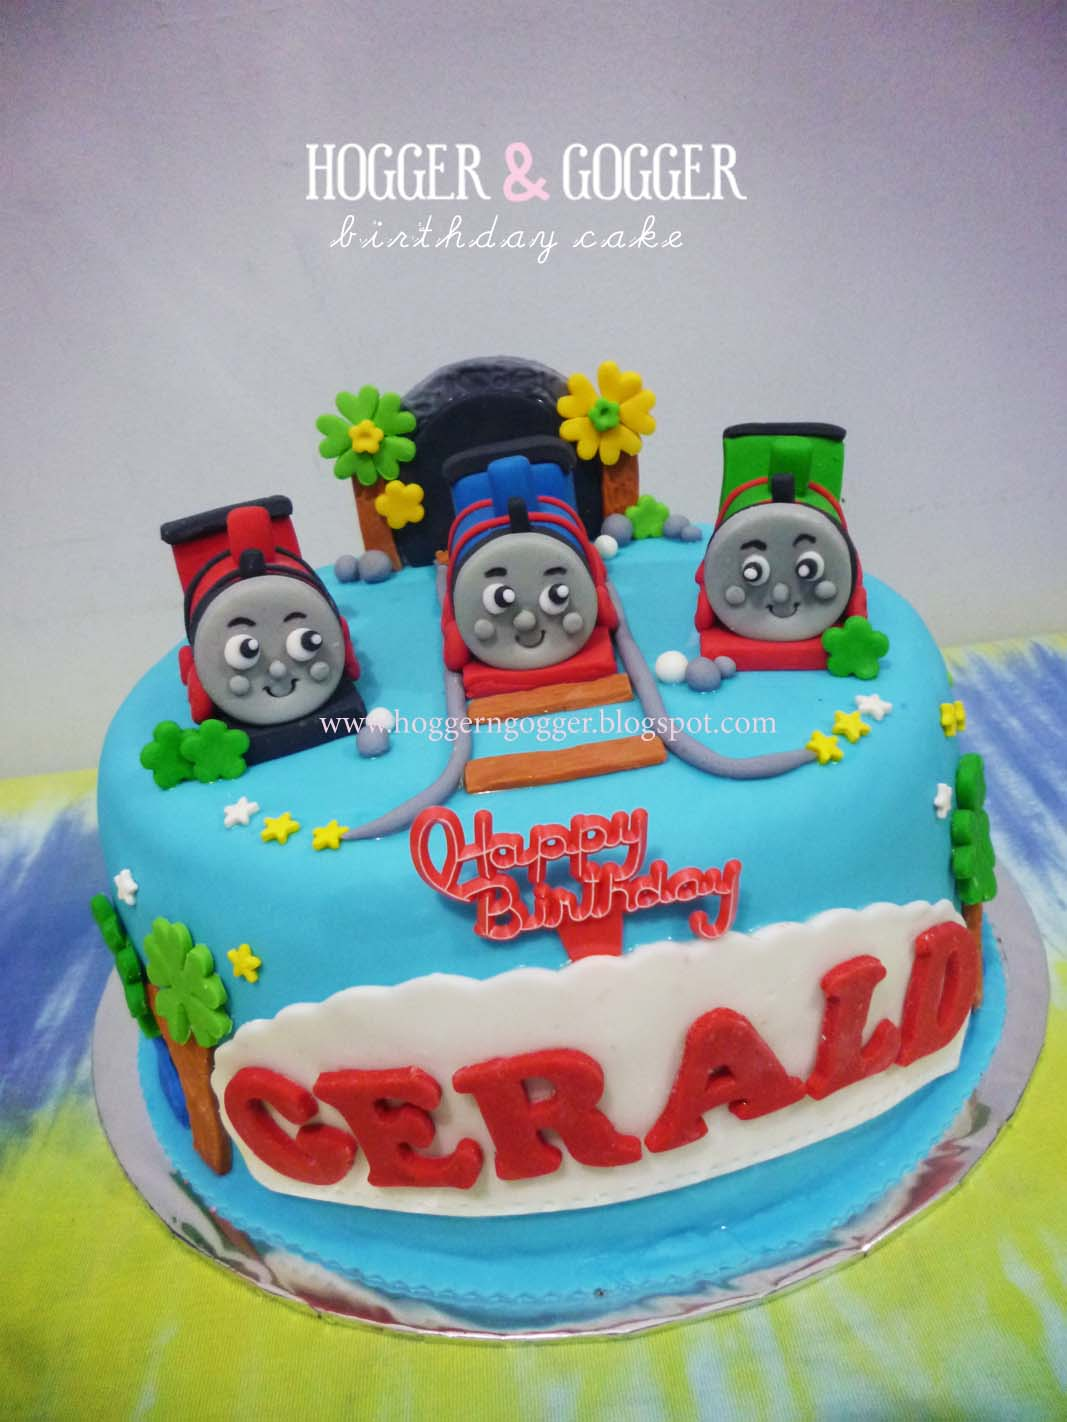 Hoggergogger Gerald Thomas Birthday Cake